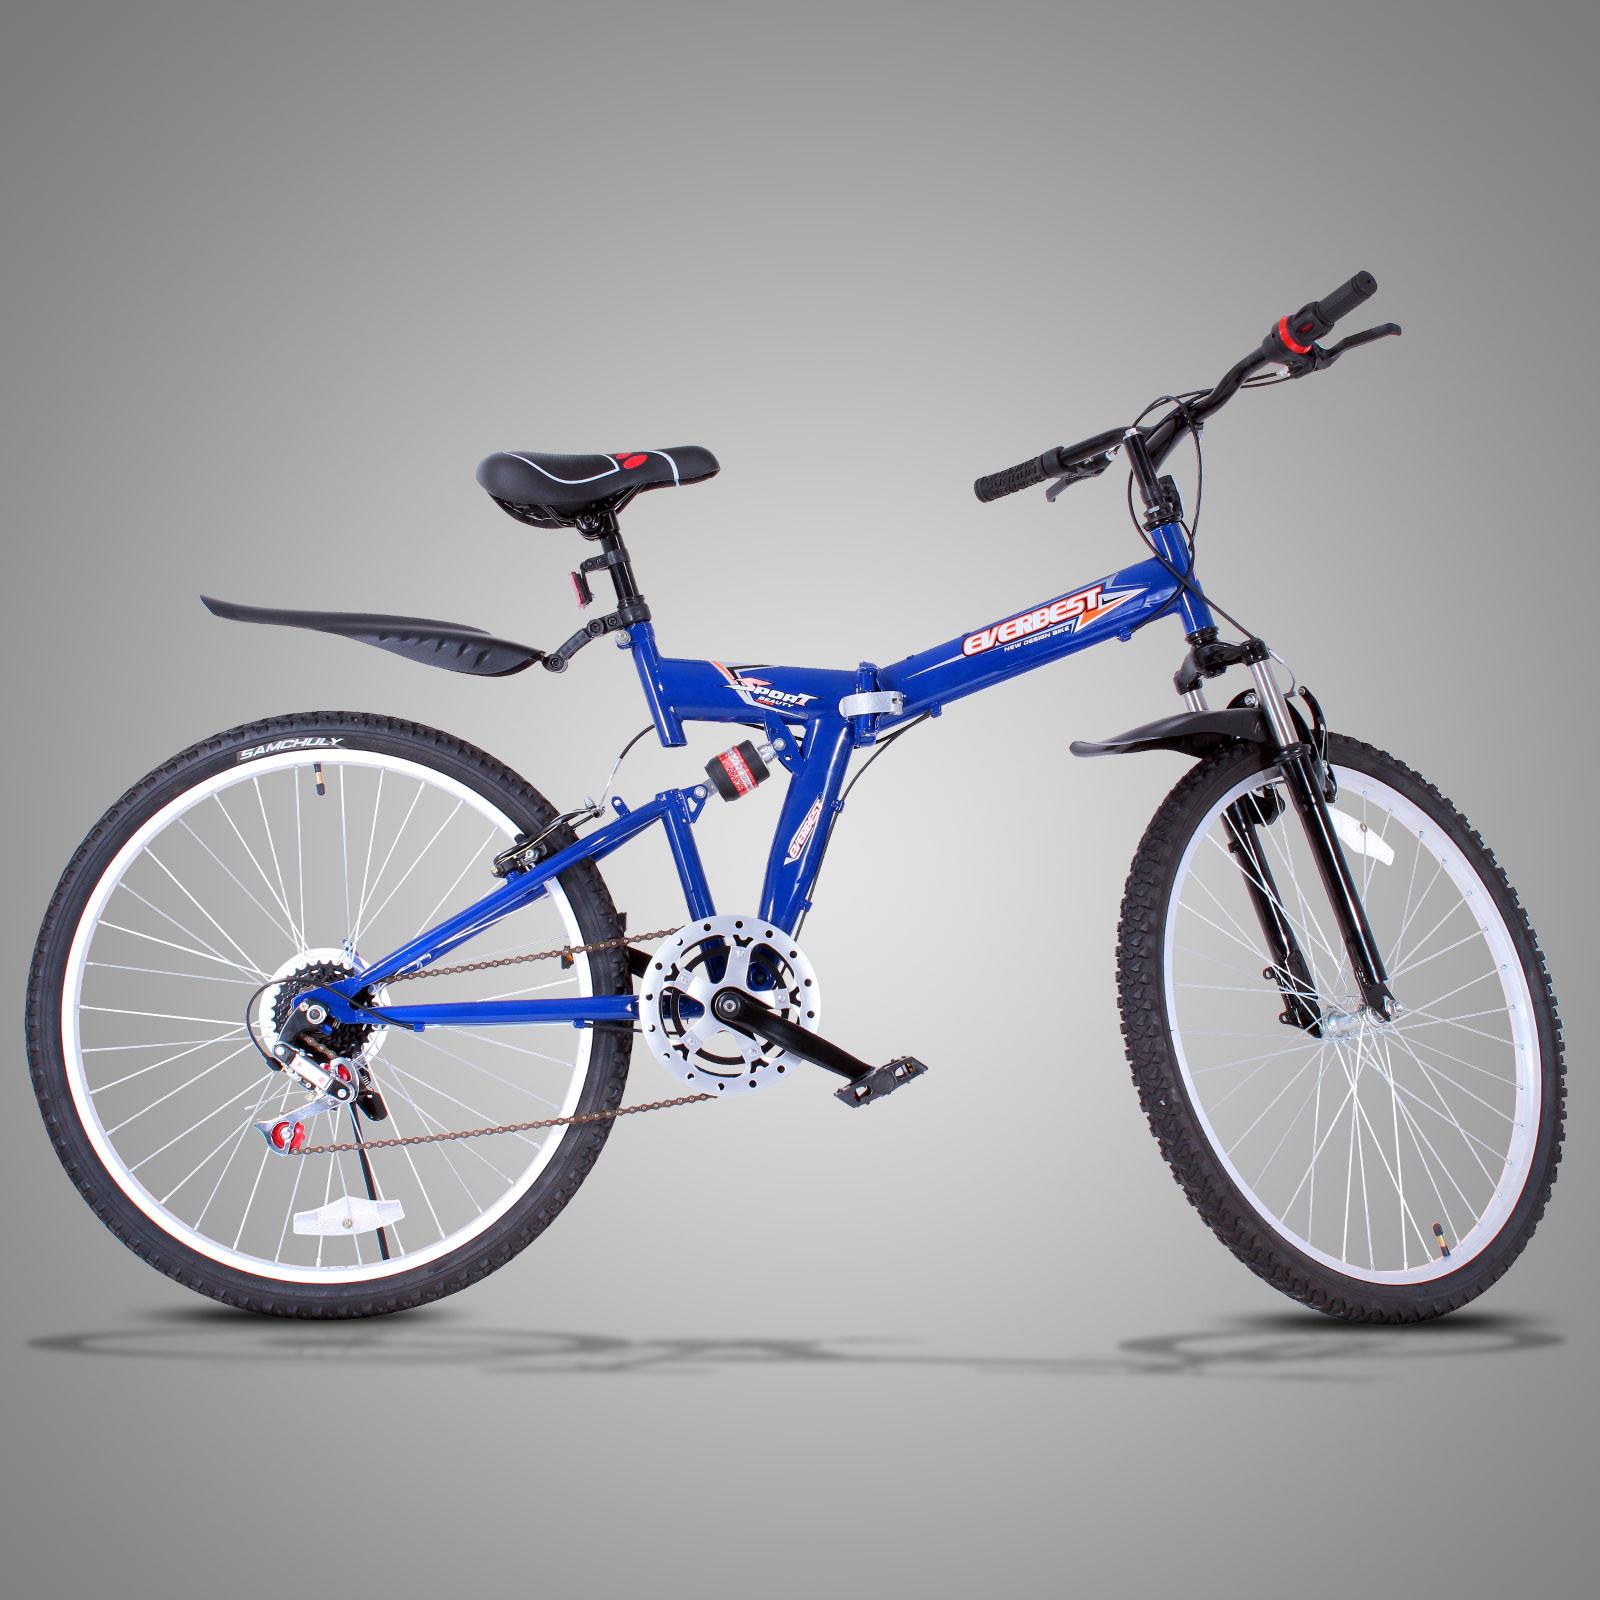 26 zoll mountainbike mtb fahrrad klapprad blau hardtail. Black Bedroom Furniture Sets. Home Design Ideas